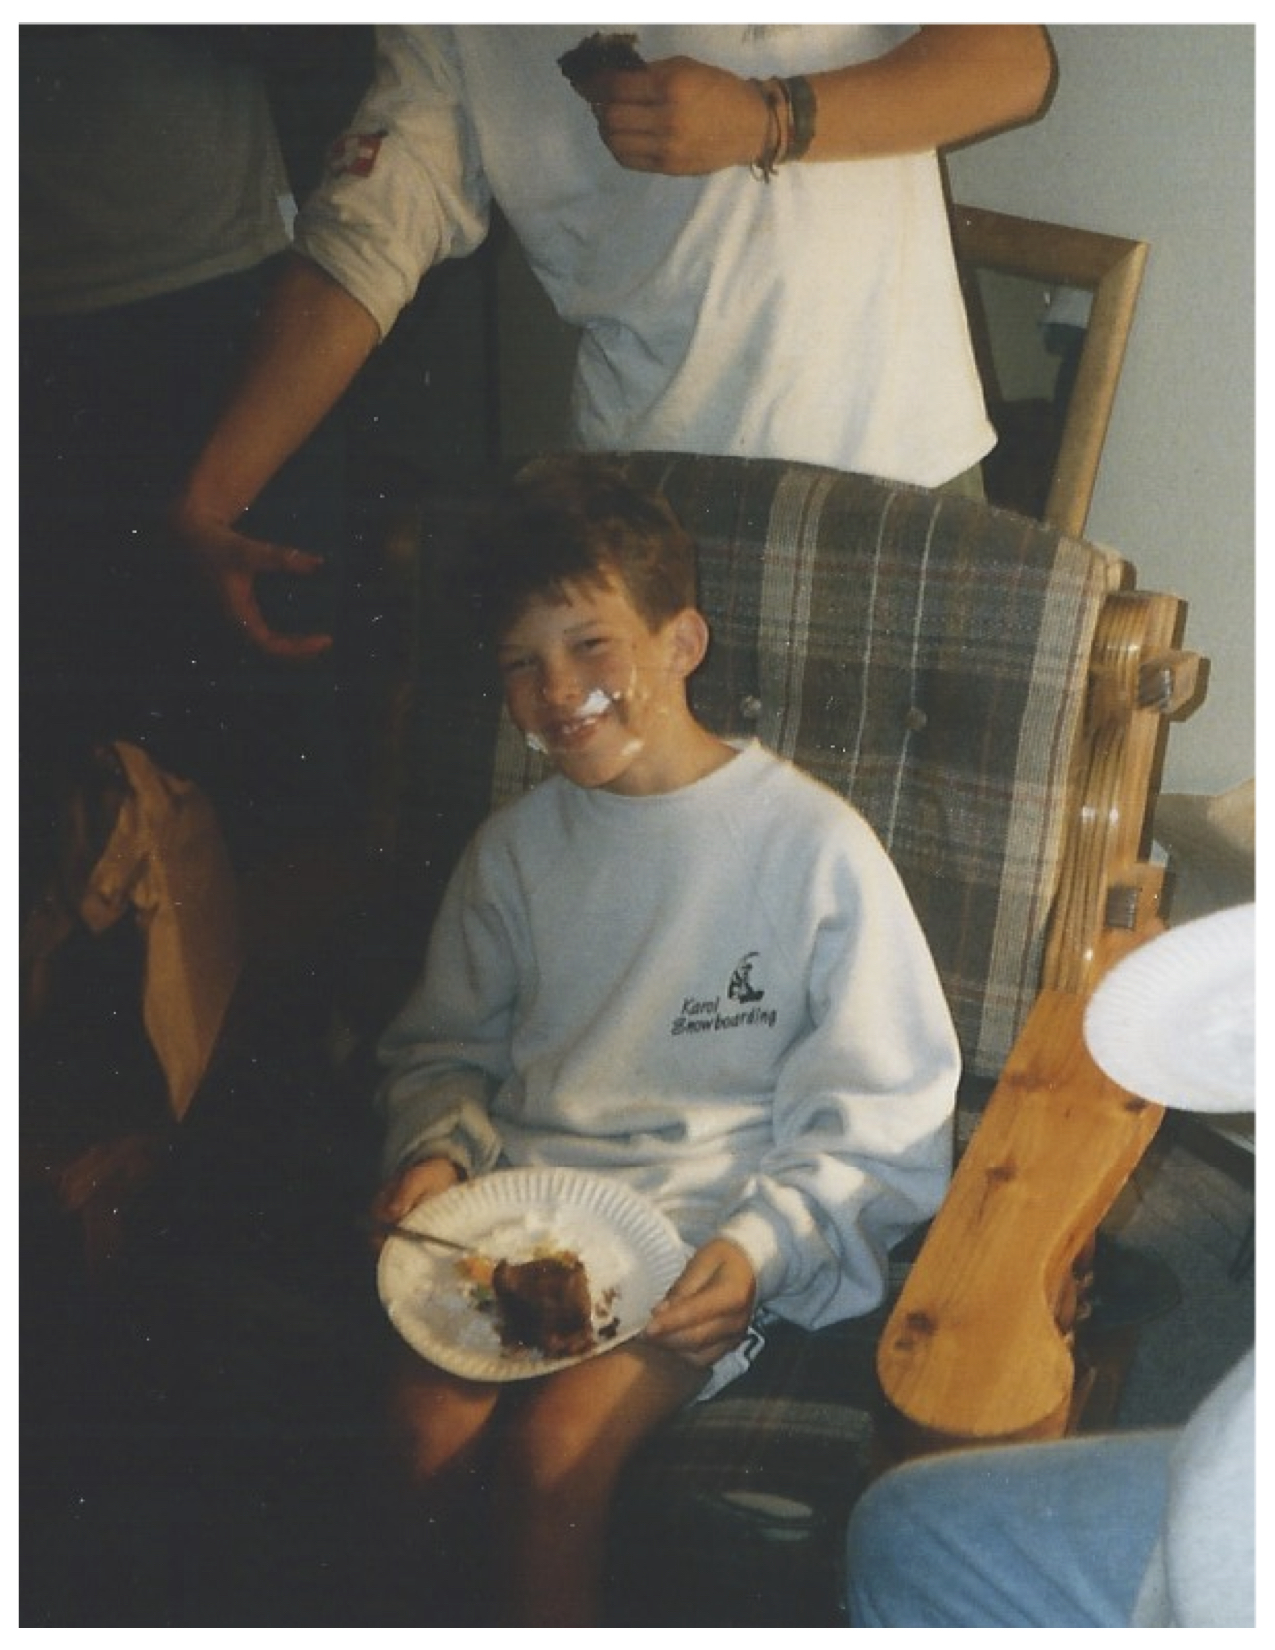 89 Camper Greg Goulet .jpg